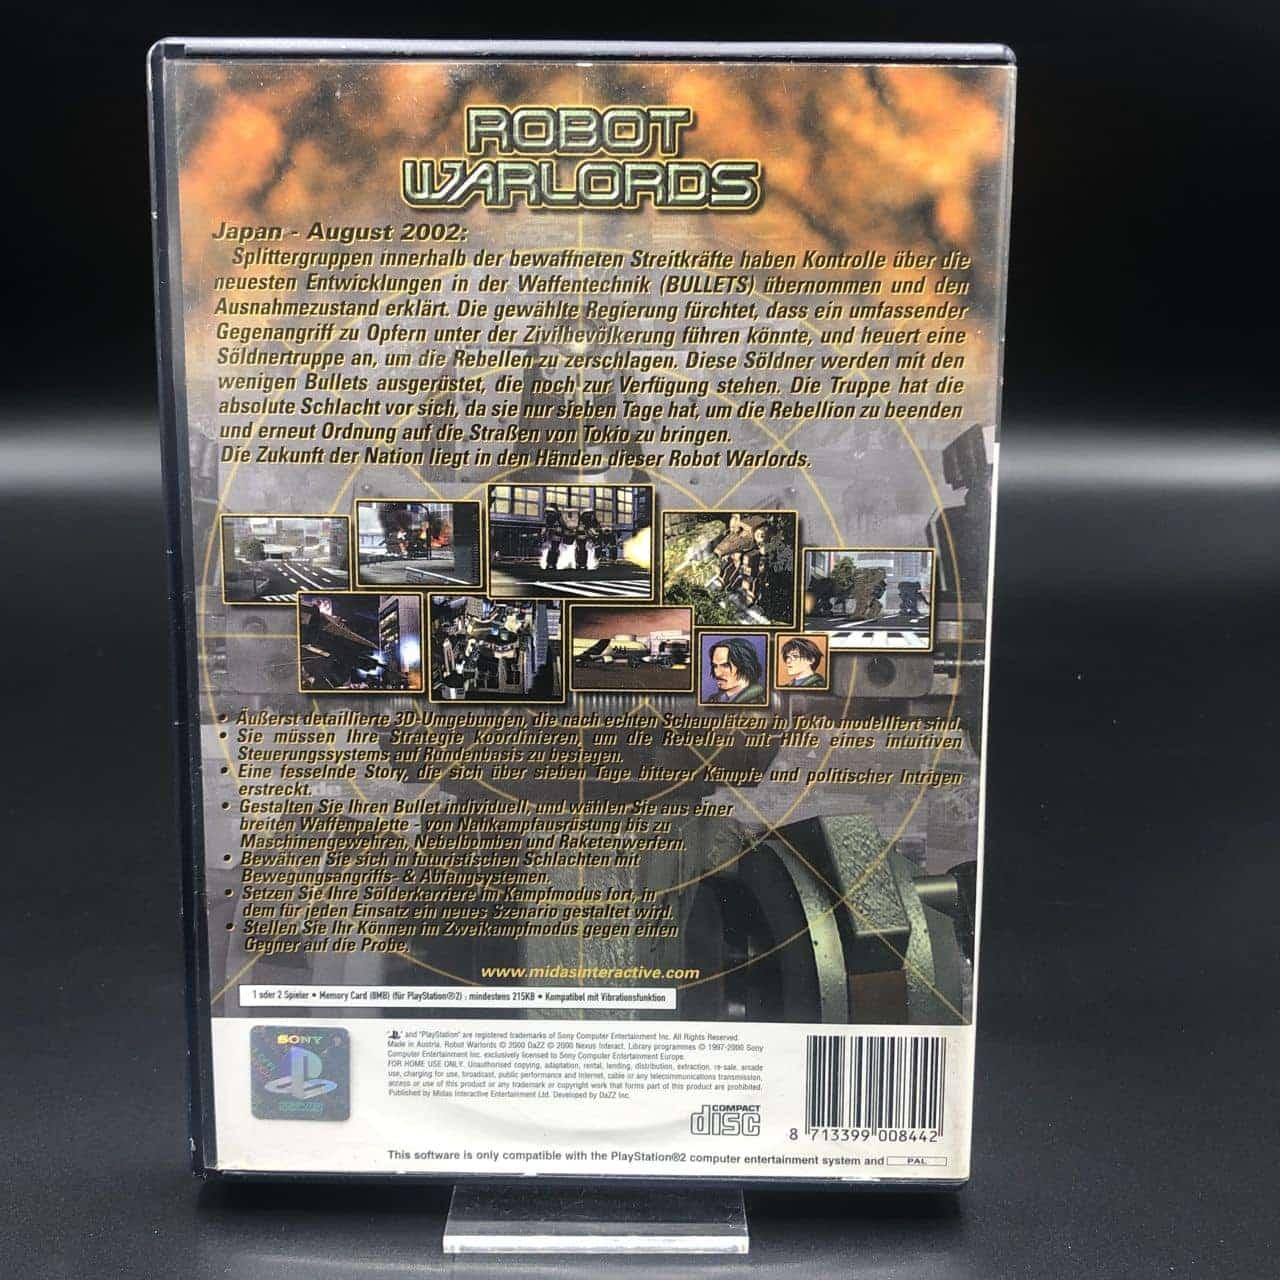 PS2 Robot Warlords (Komplett) (Gebrauchsspuren) Sony PlayStation 2